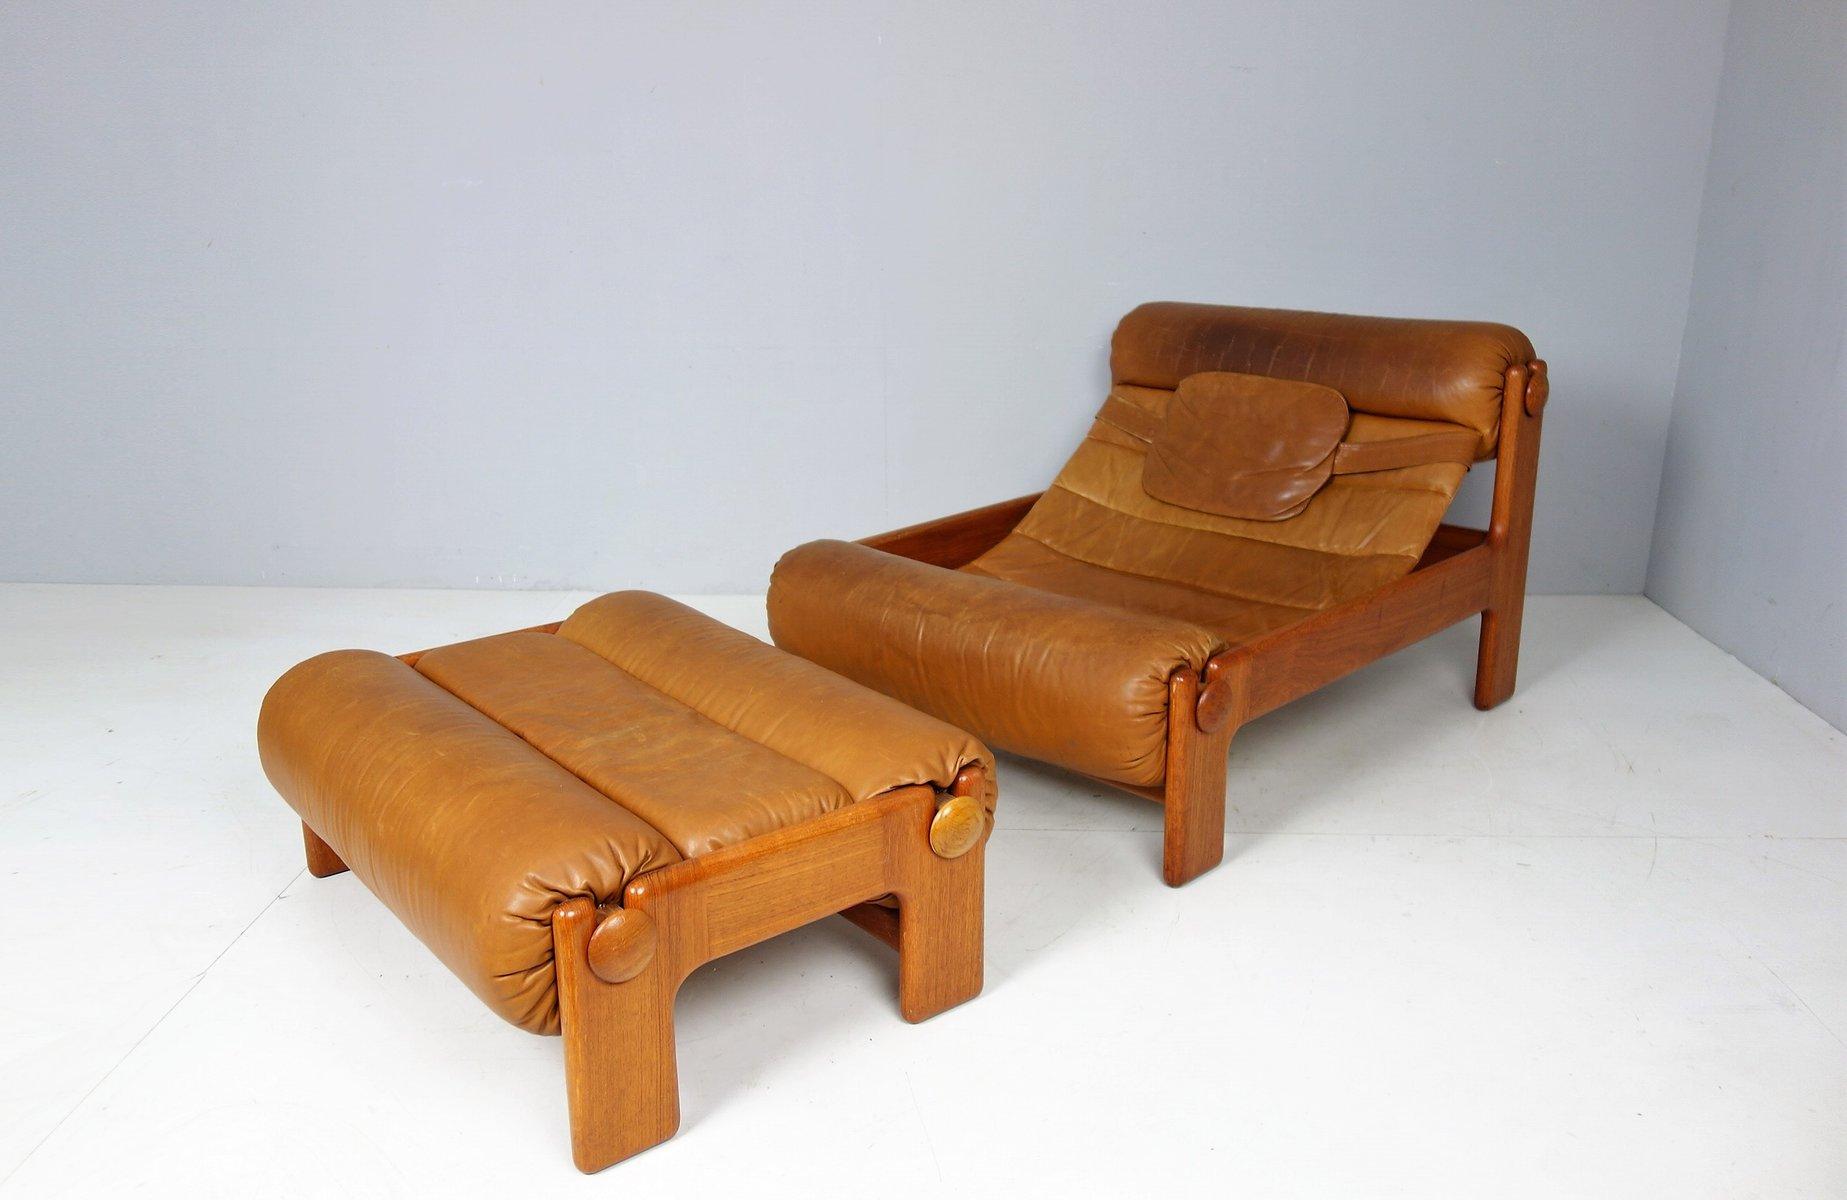 Vintage Swedish Lounge Chair & Ottoman 1960s for sale at Pamono